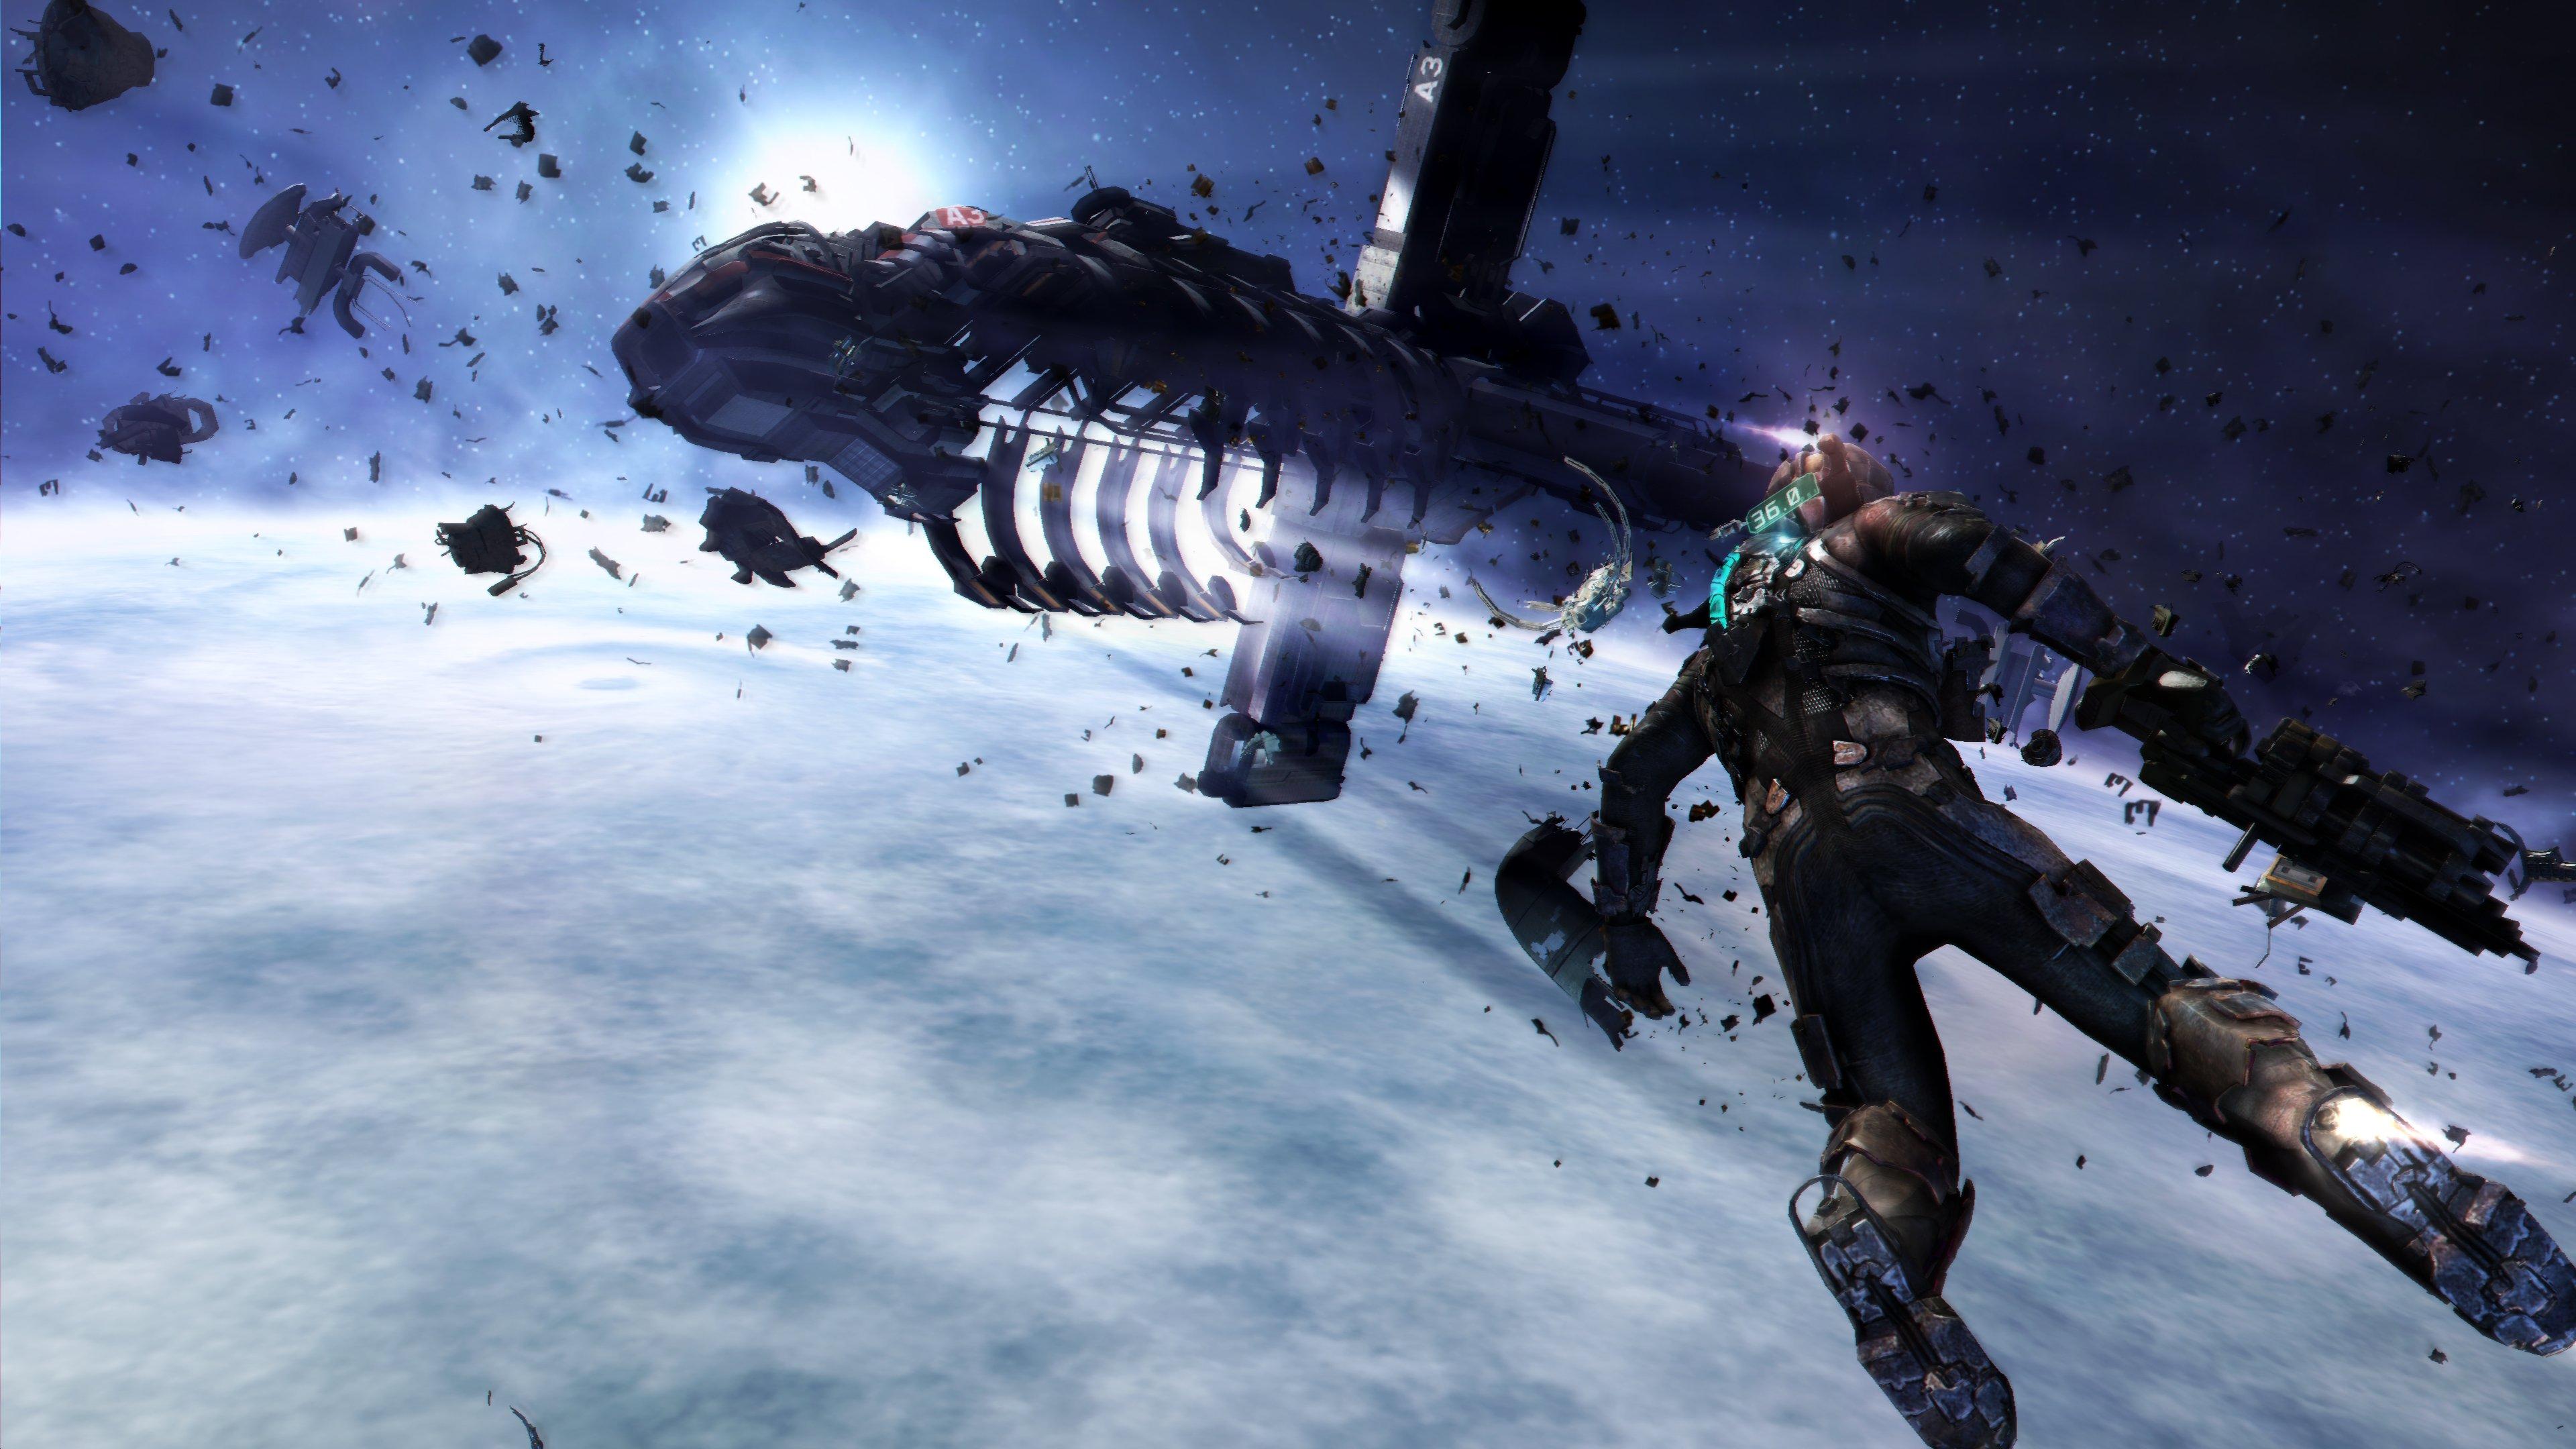 Dead Space Survival Horror Game HD Wallpaper Wallpapers Hood